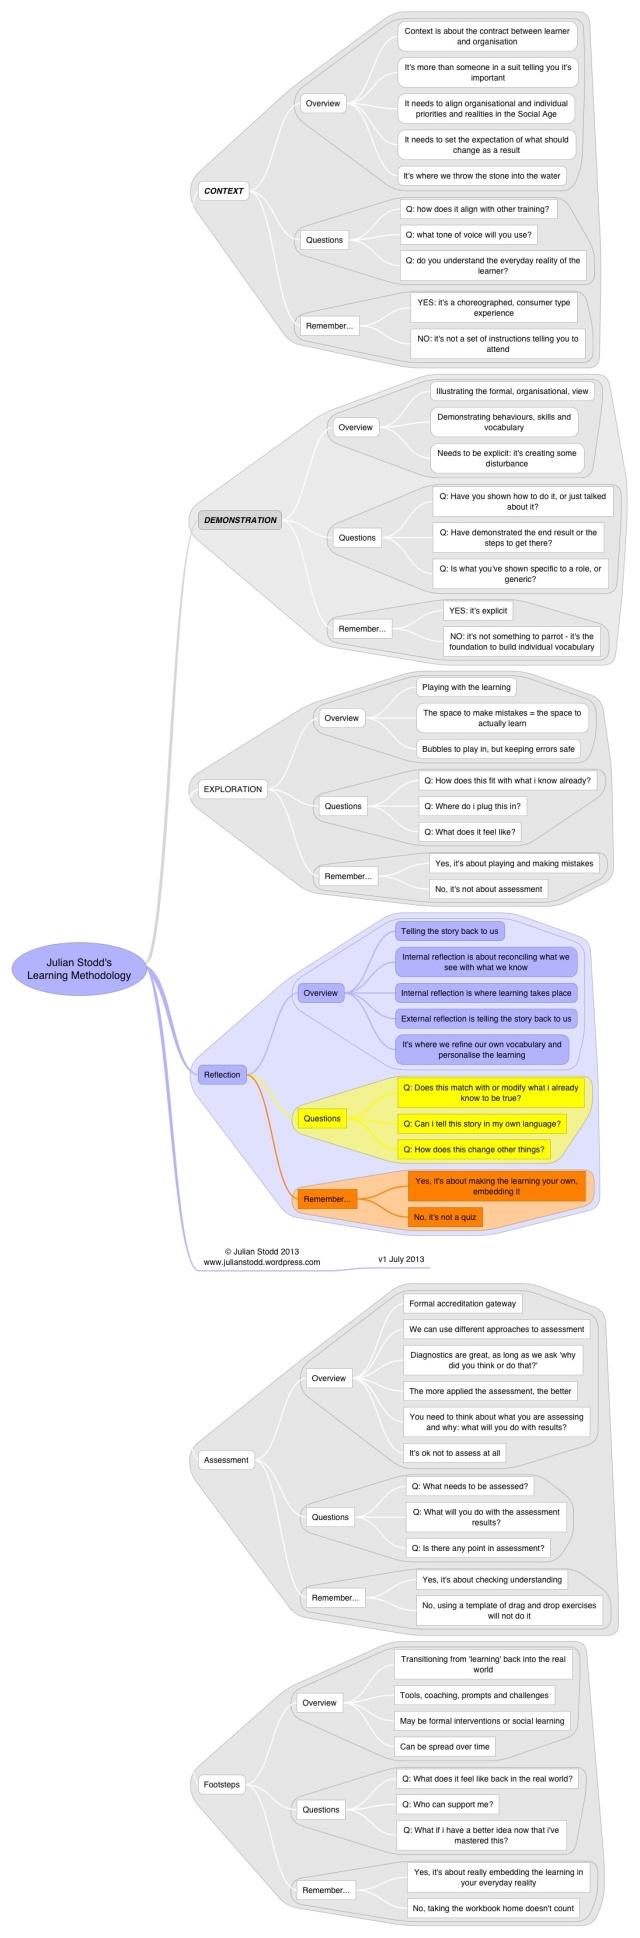 Methodology - reflection